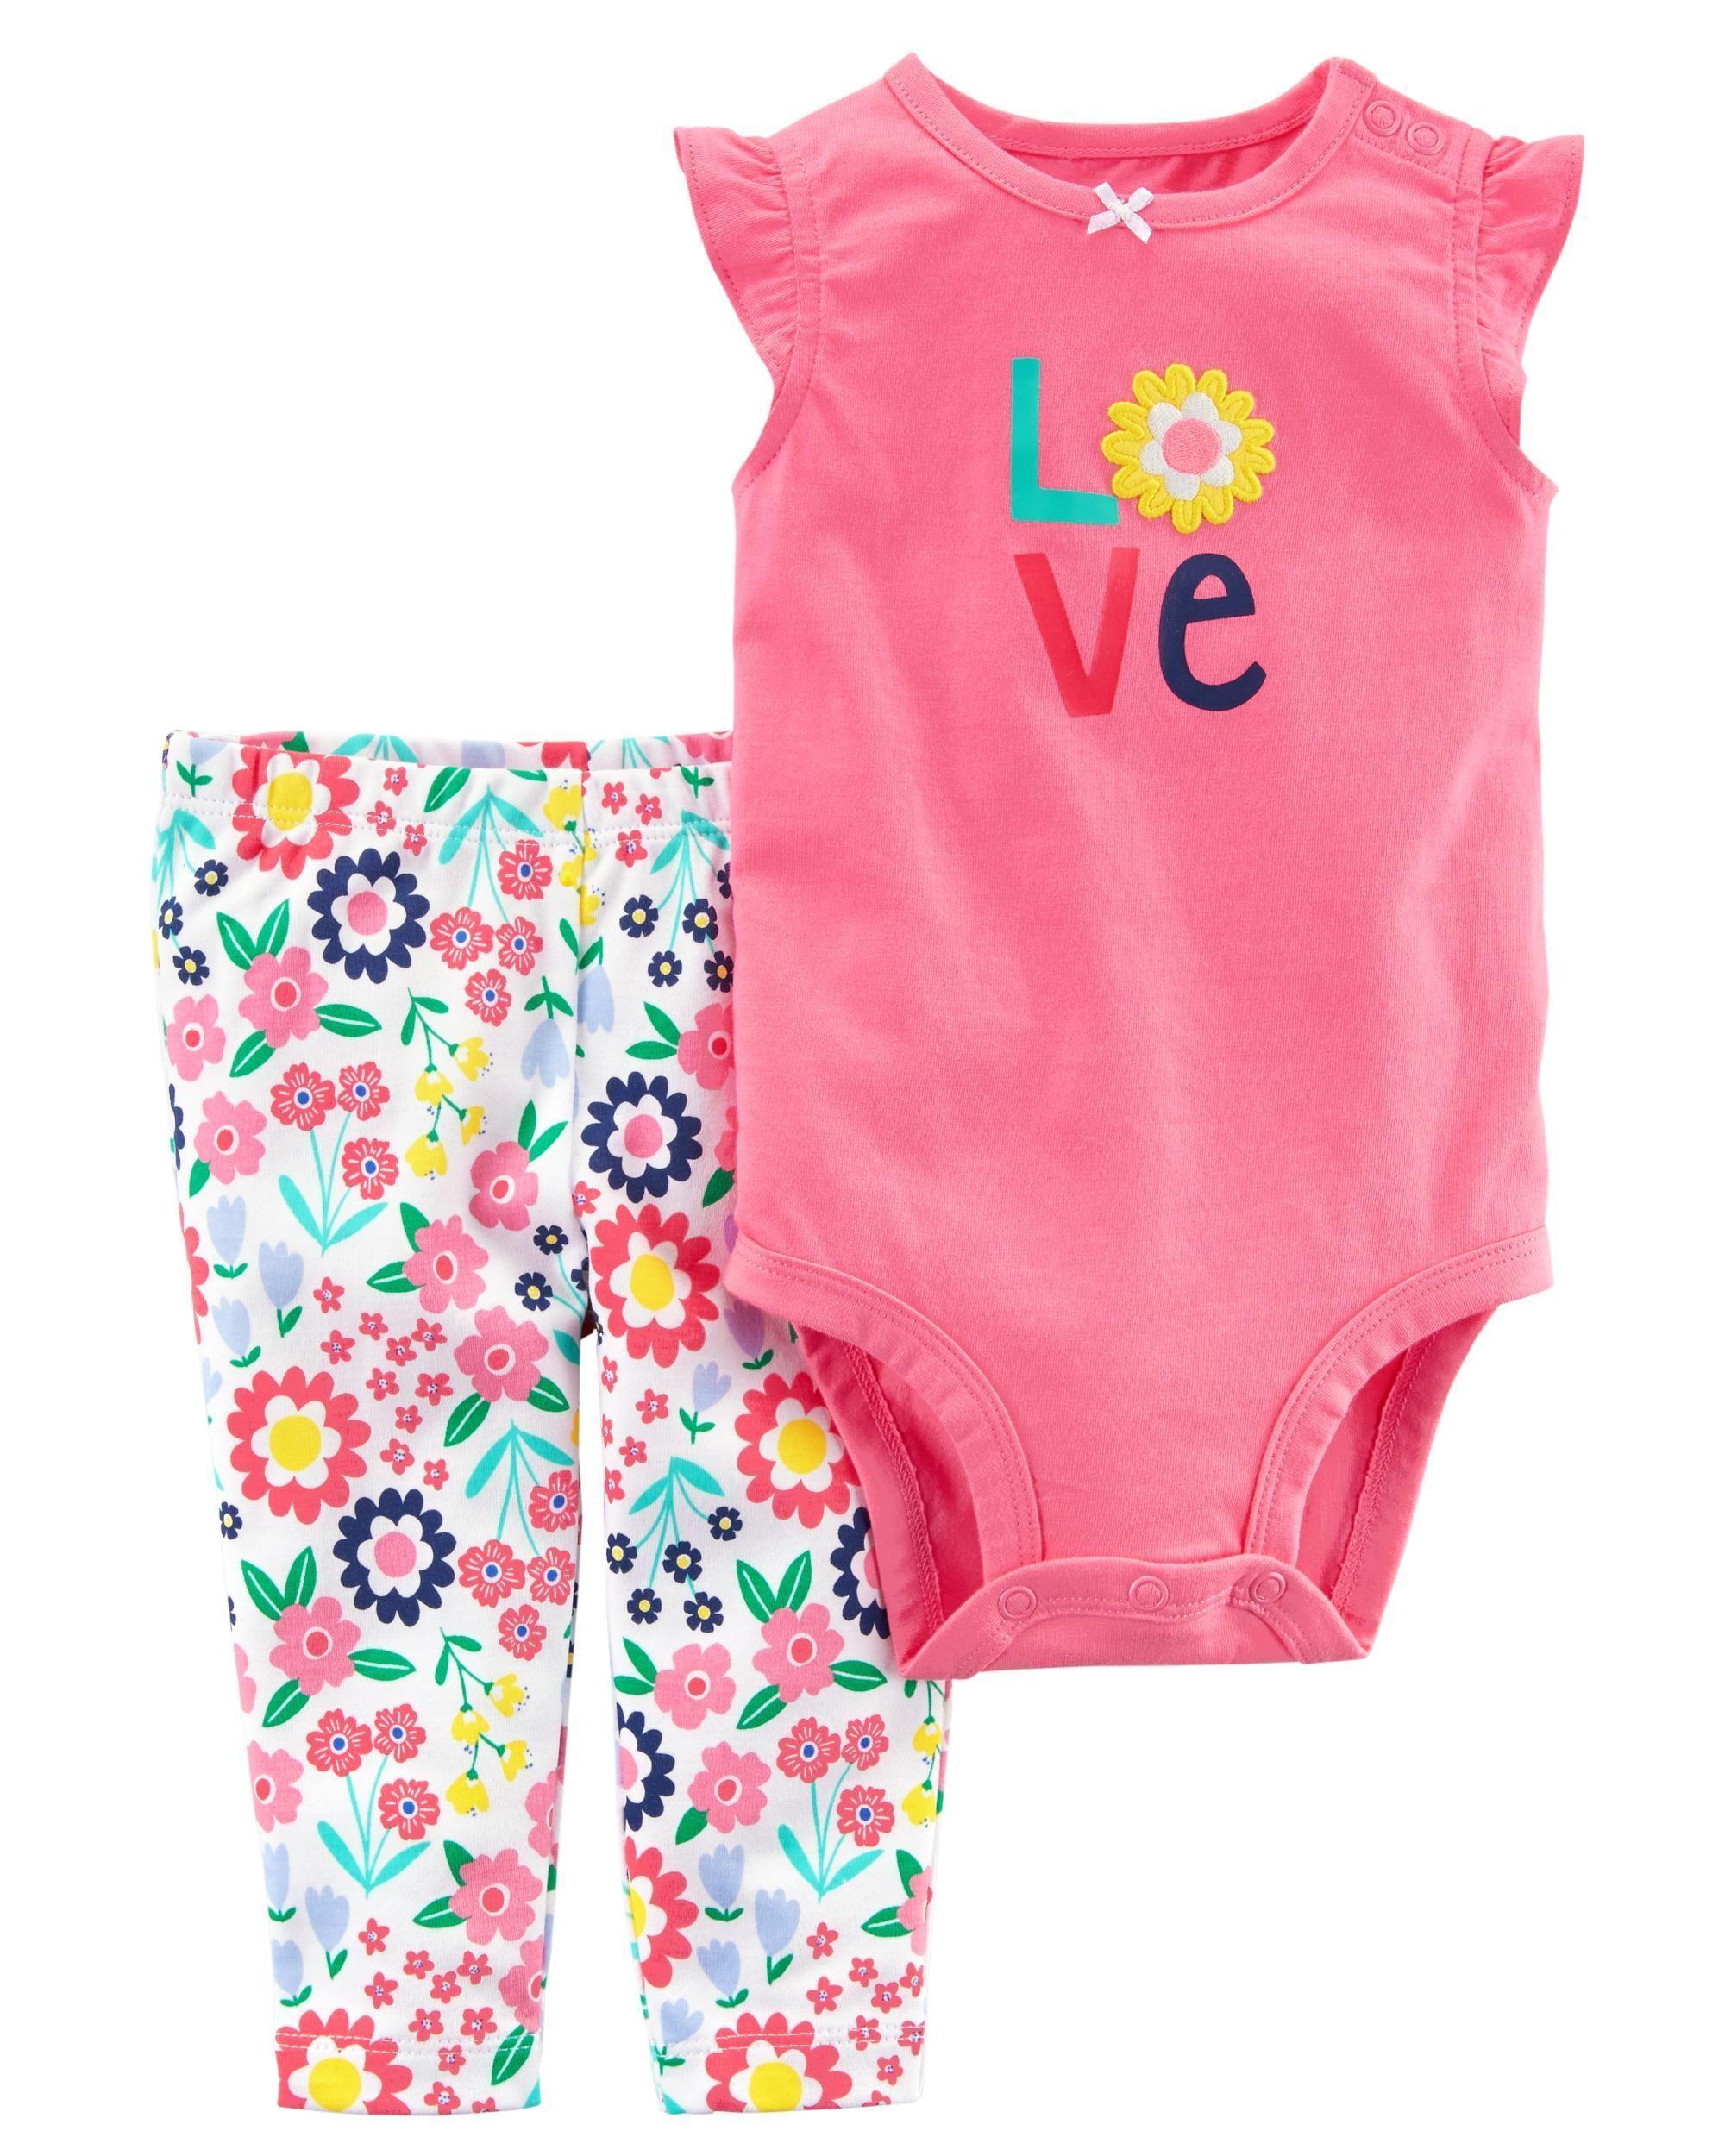 6966fa82c Baby Girl 2-Piece Bodysuit Pant Set   Carters.com   Future babygirl ...